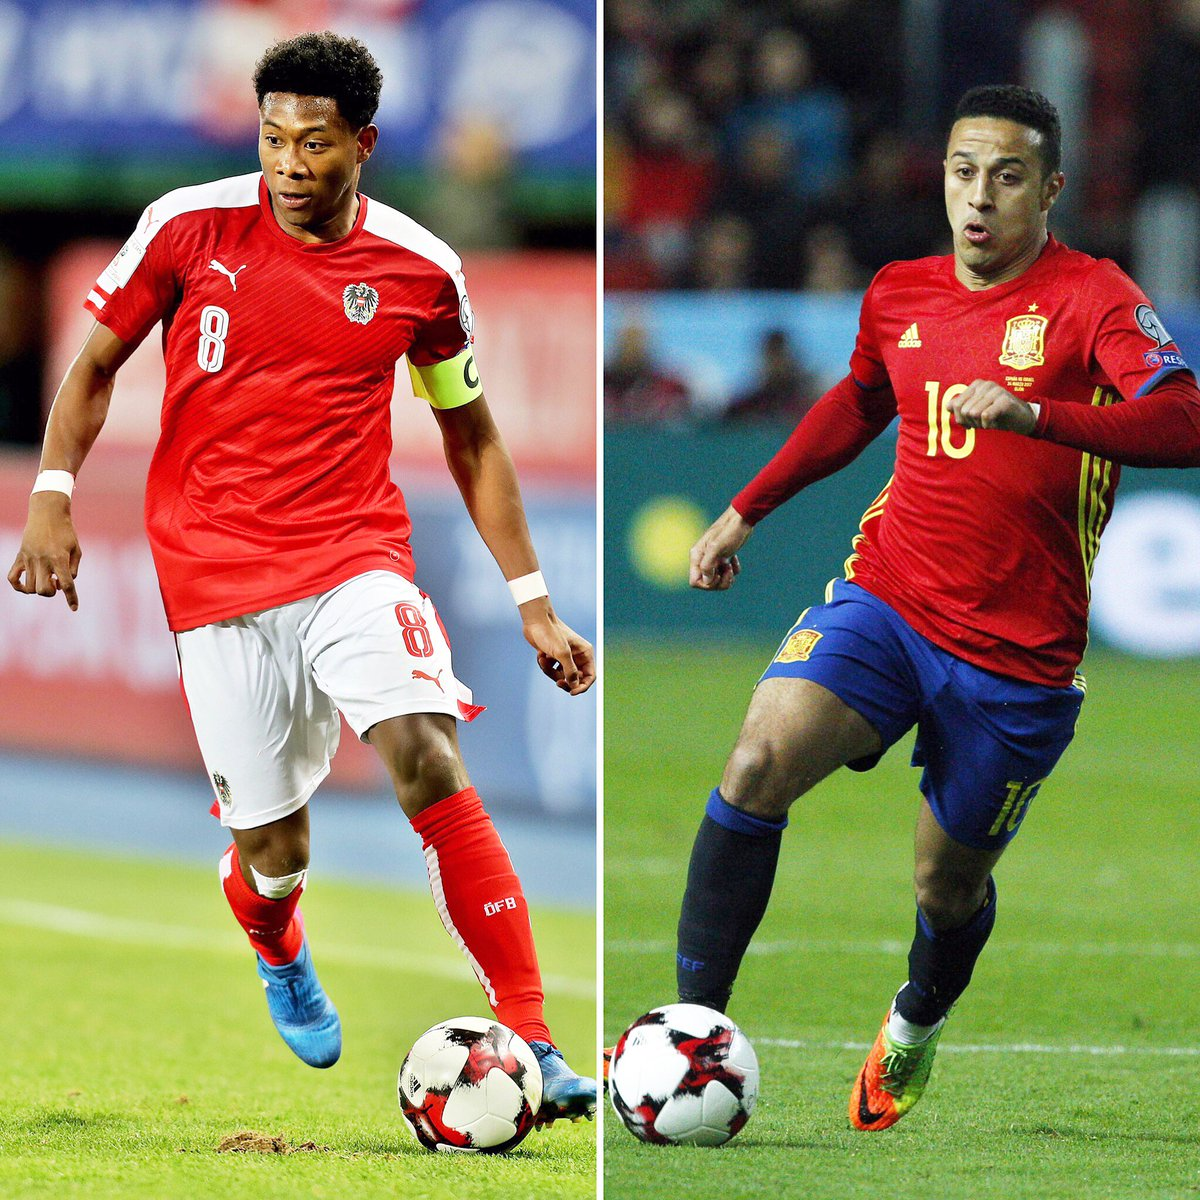 #AUTMDA 2:0 ☑️ #ESPISR 4:1 ☑️ Glückwunsch, @David_Alaba & @Thiago6...